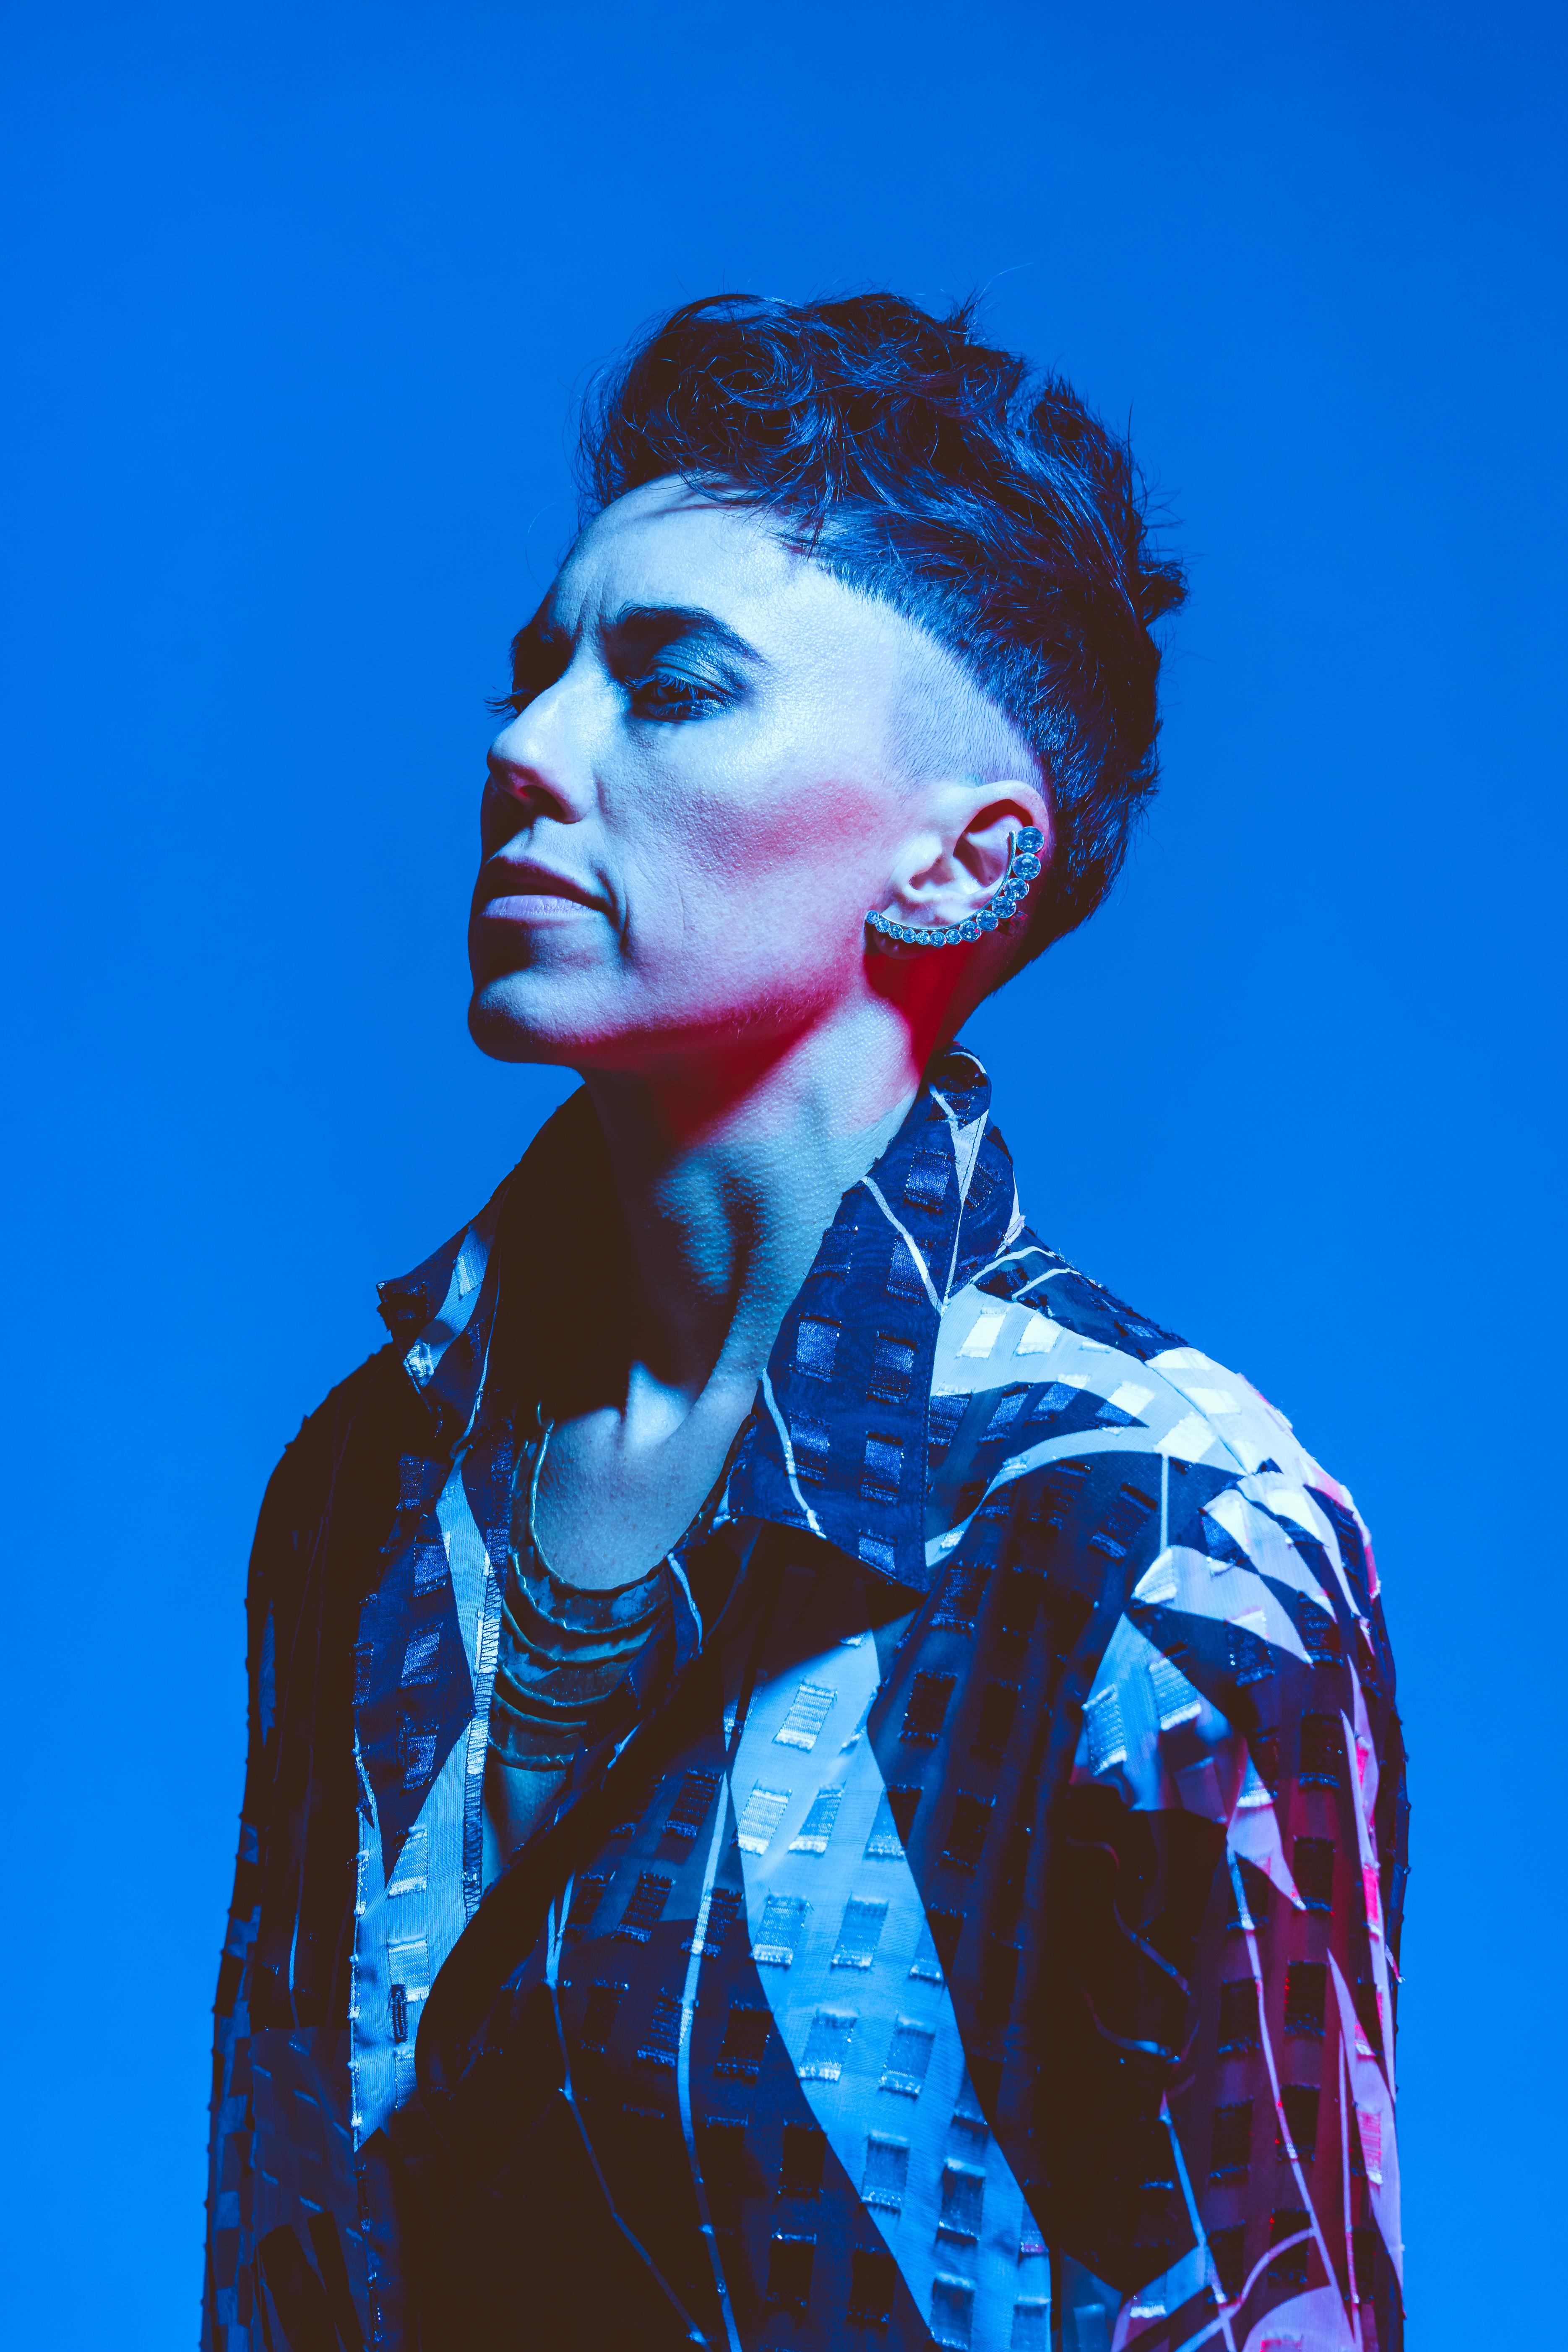 Gina Chavez, an Austin Latin pop artist, will host the JetStream Music Festival.